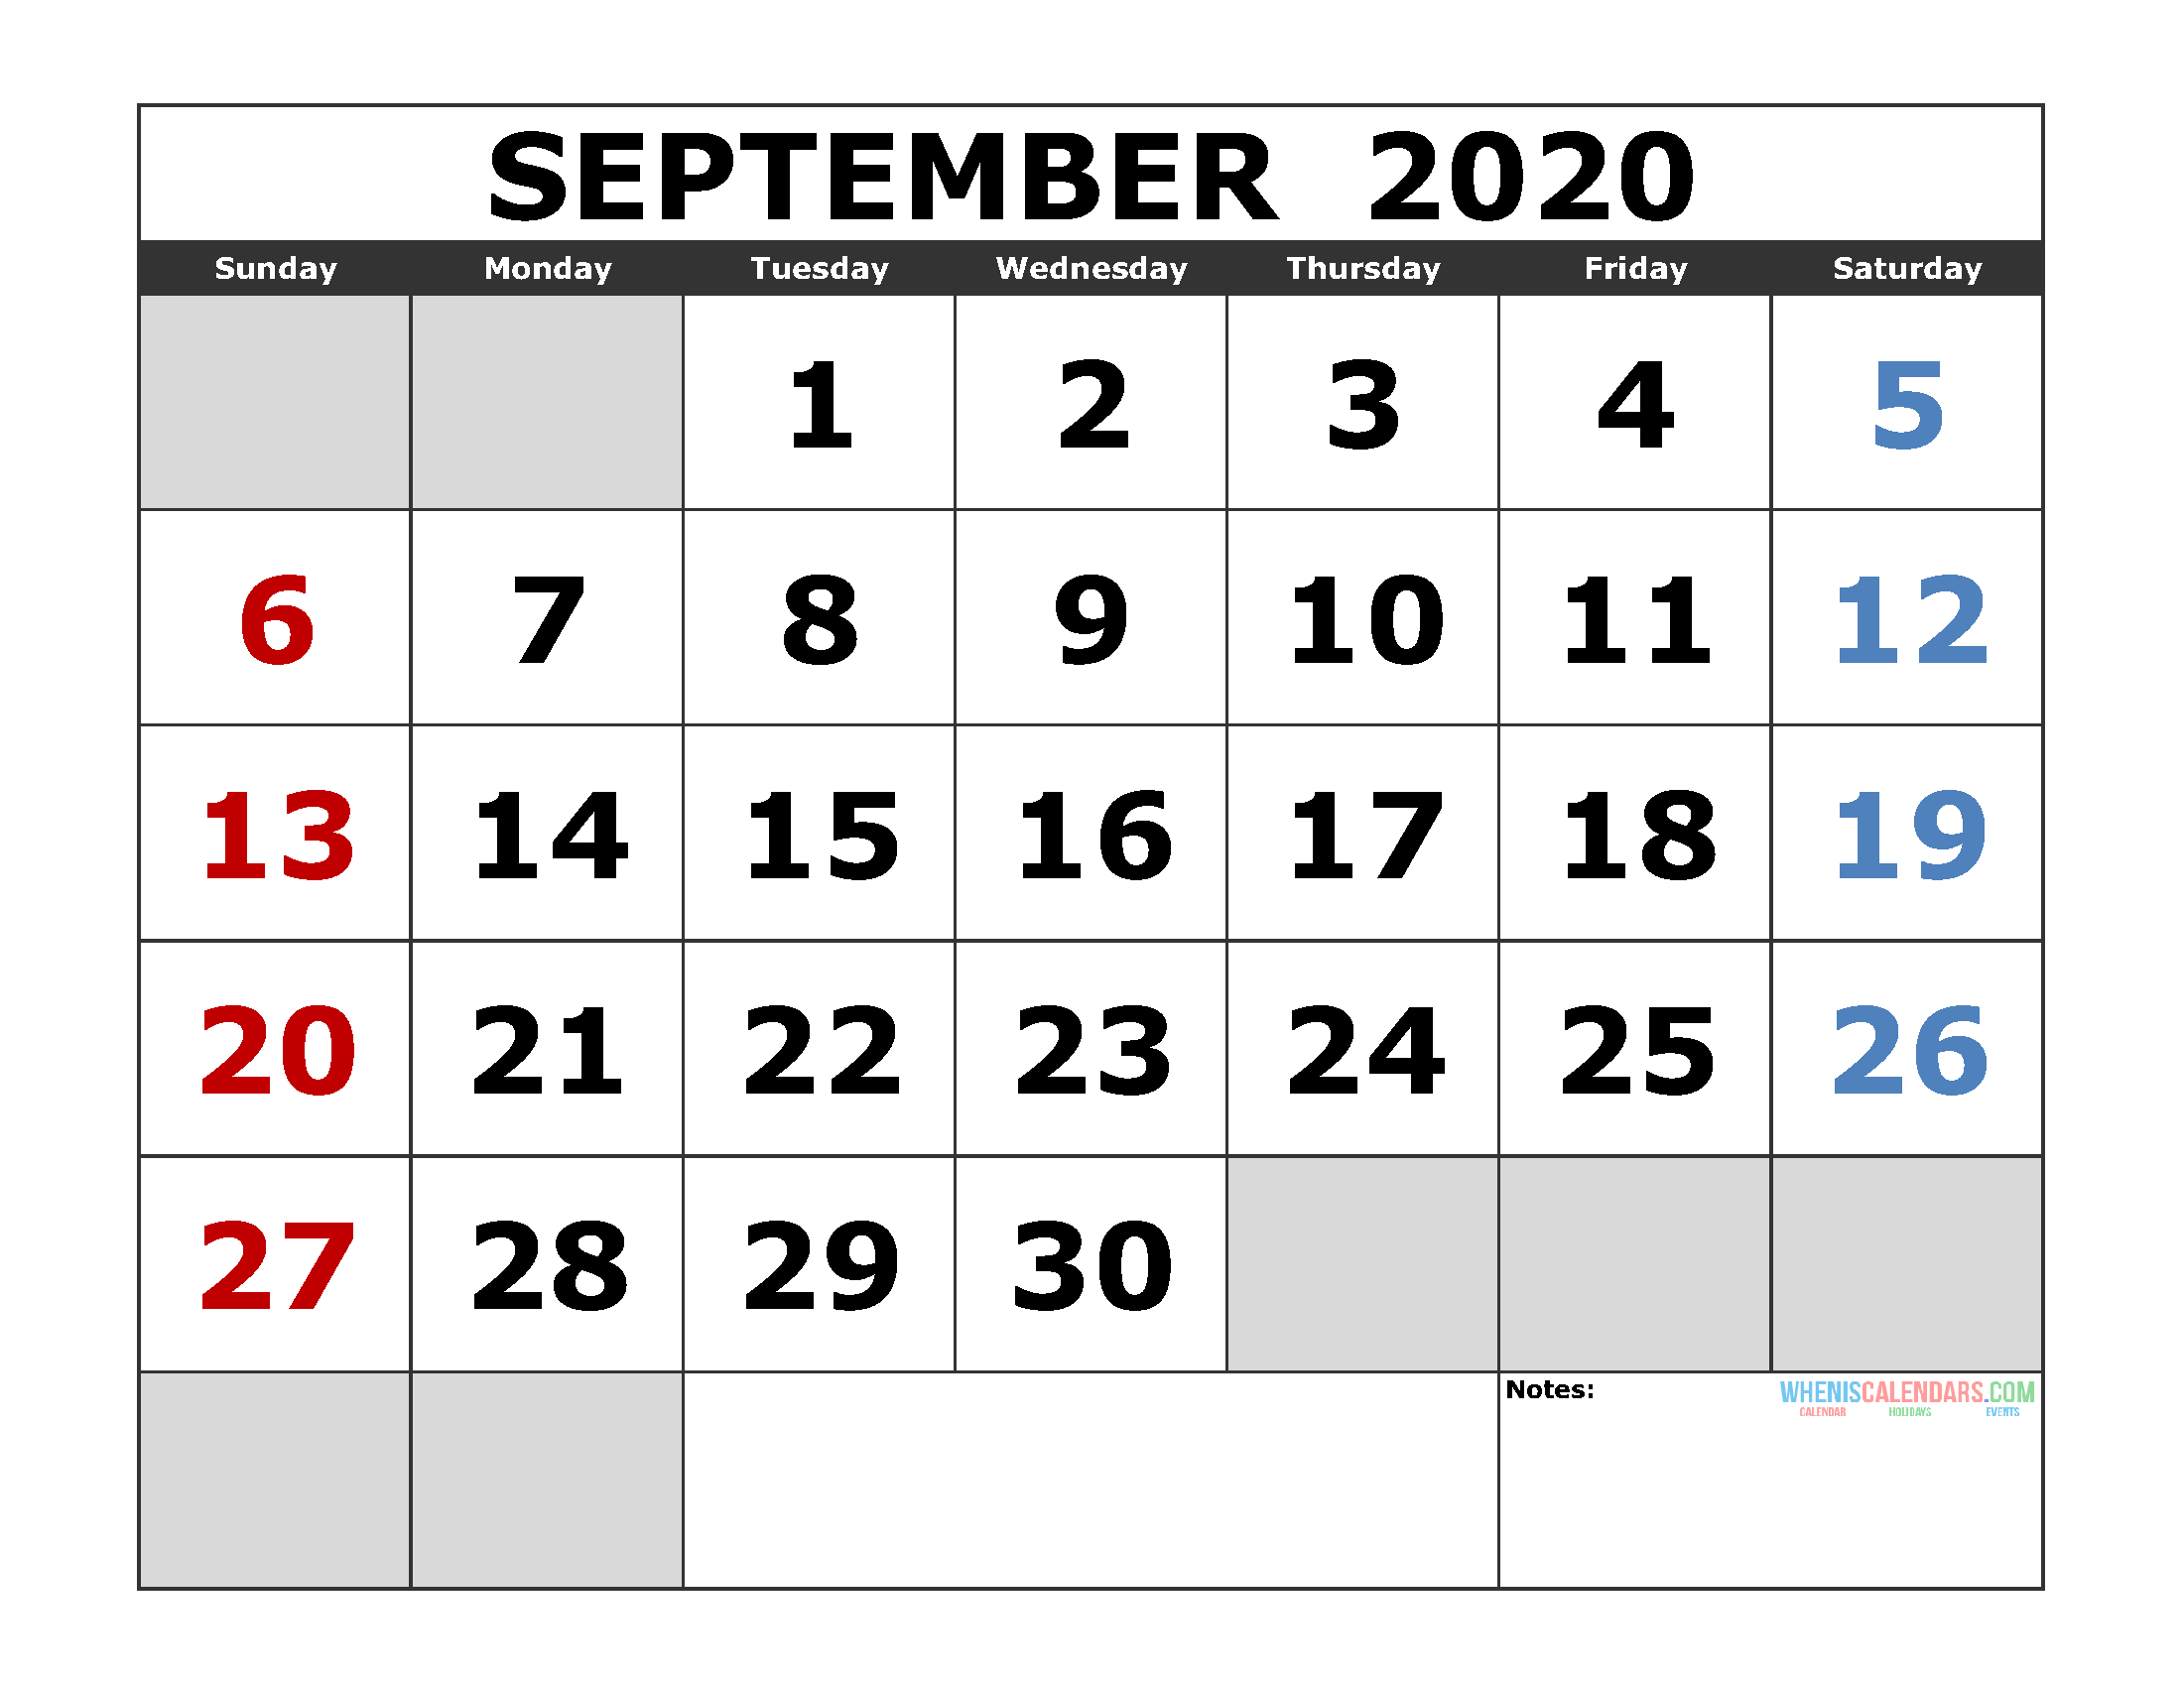 September 2020 Printable Calendar Template Excel, Pdf, Image